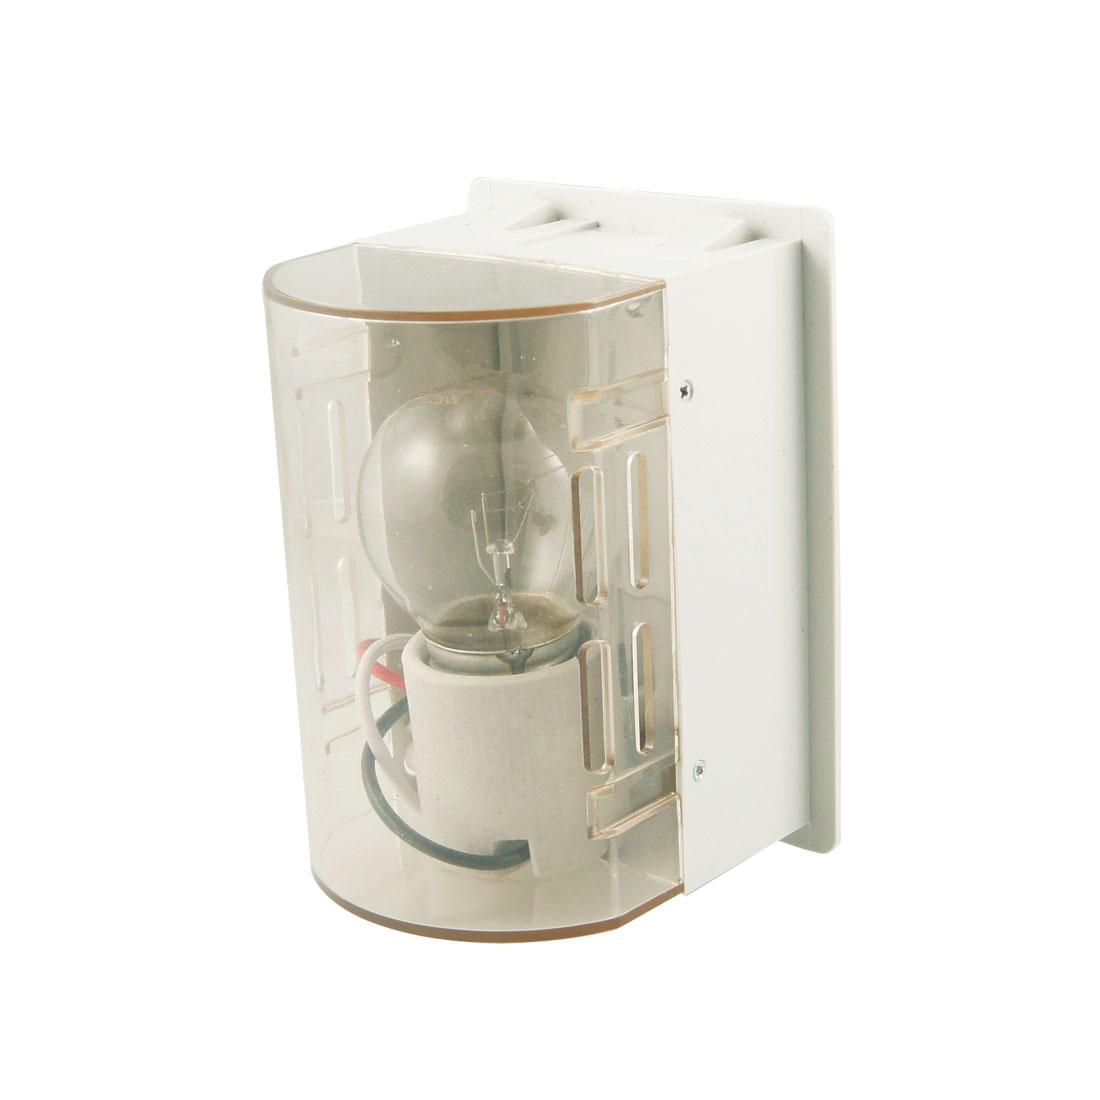 CM-1 Model AC 220V 40W Wardrobe Cabinet Lighting Lamp